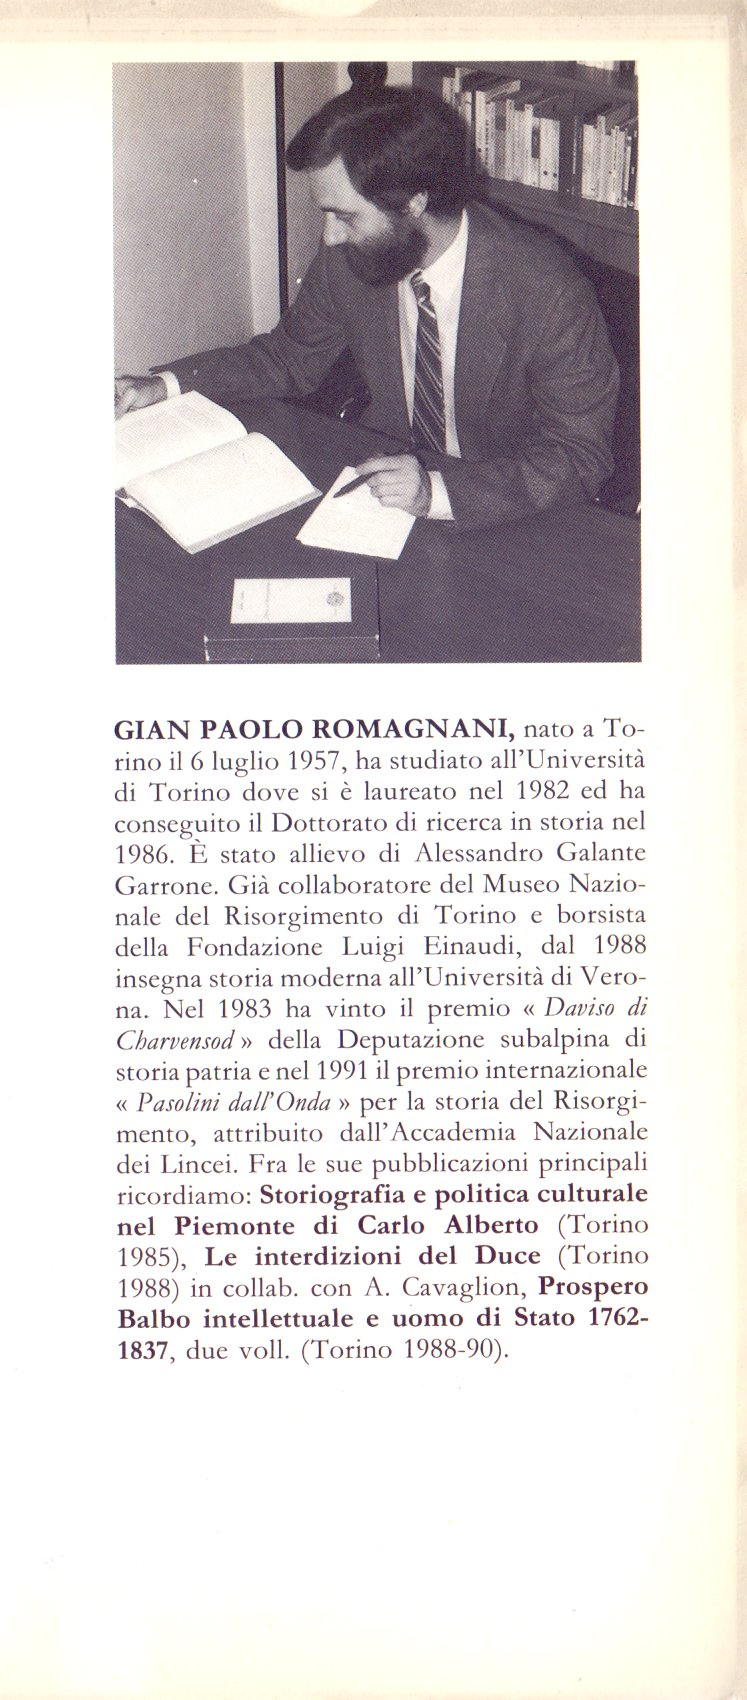 Vincenzo Gioberti, Agostino Chiodo, Gabriele De Launay, Massimo d'Azeglio.